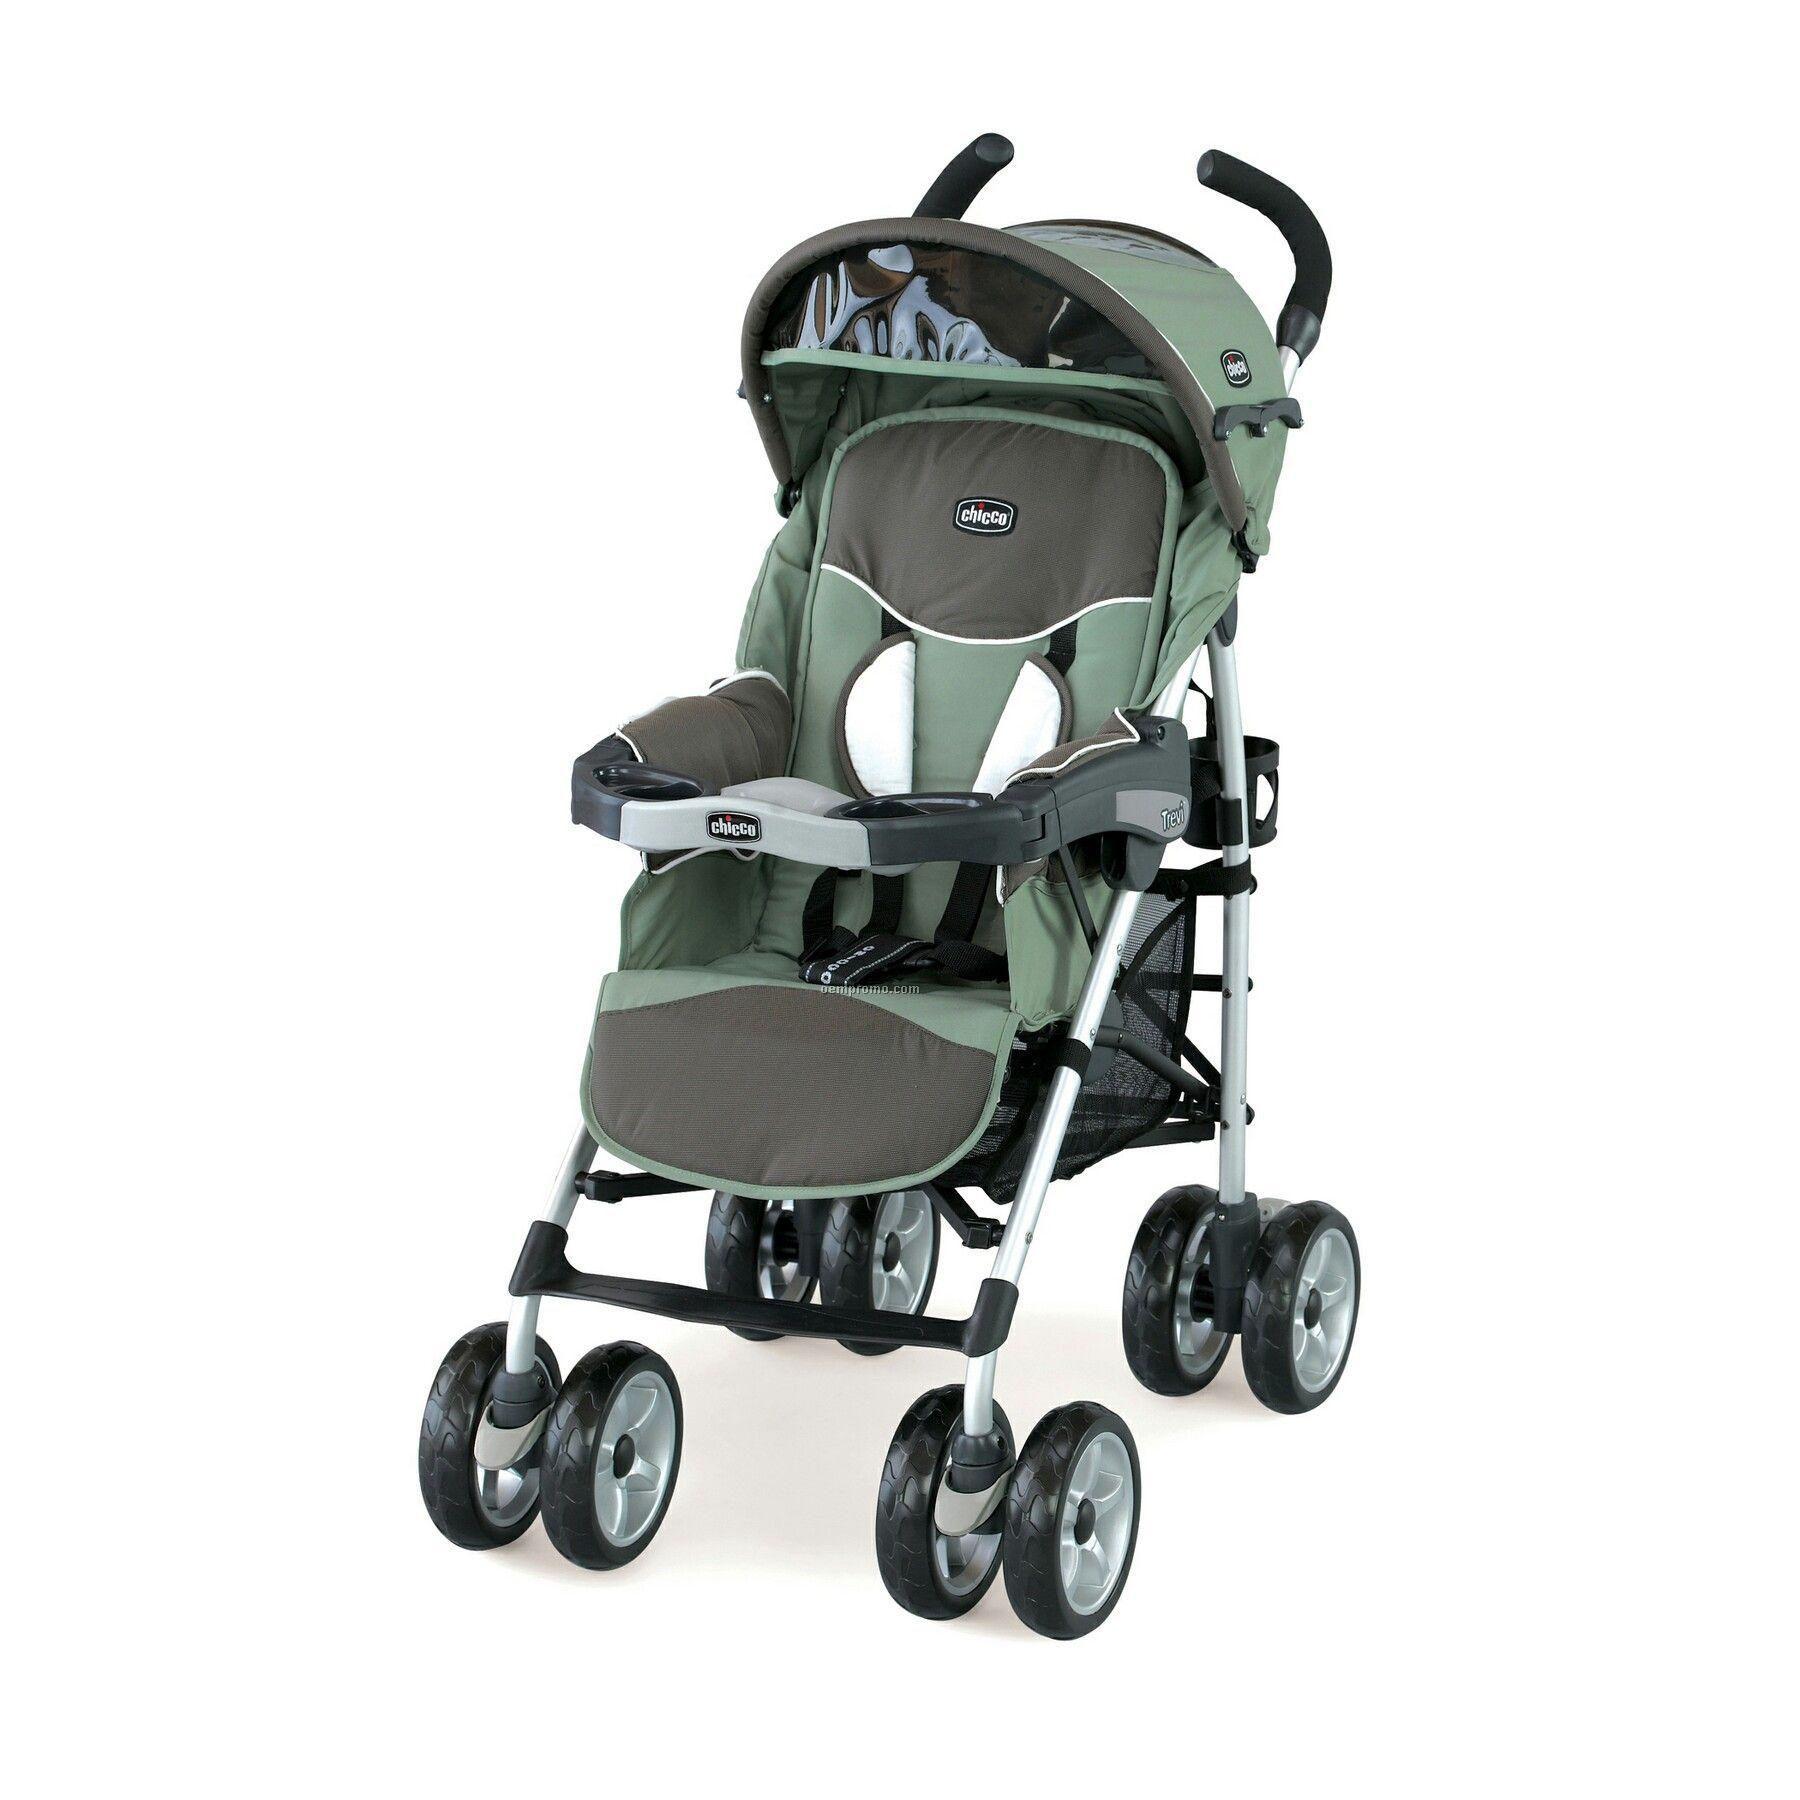 Chicco Trevi Full Size Lightweight Stroller Adventure